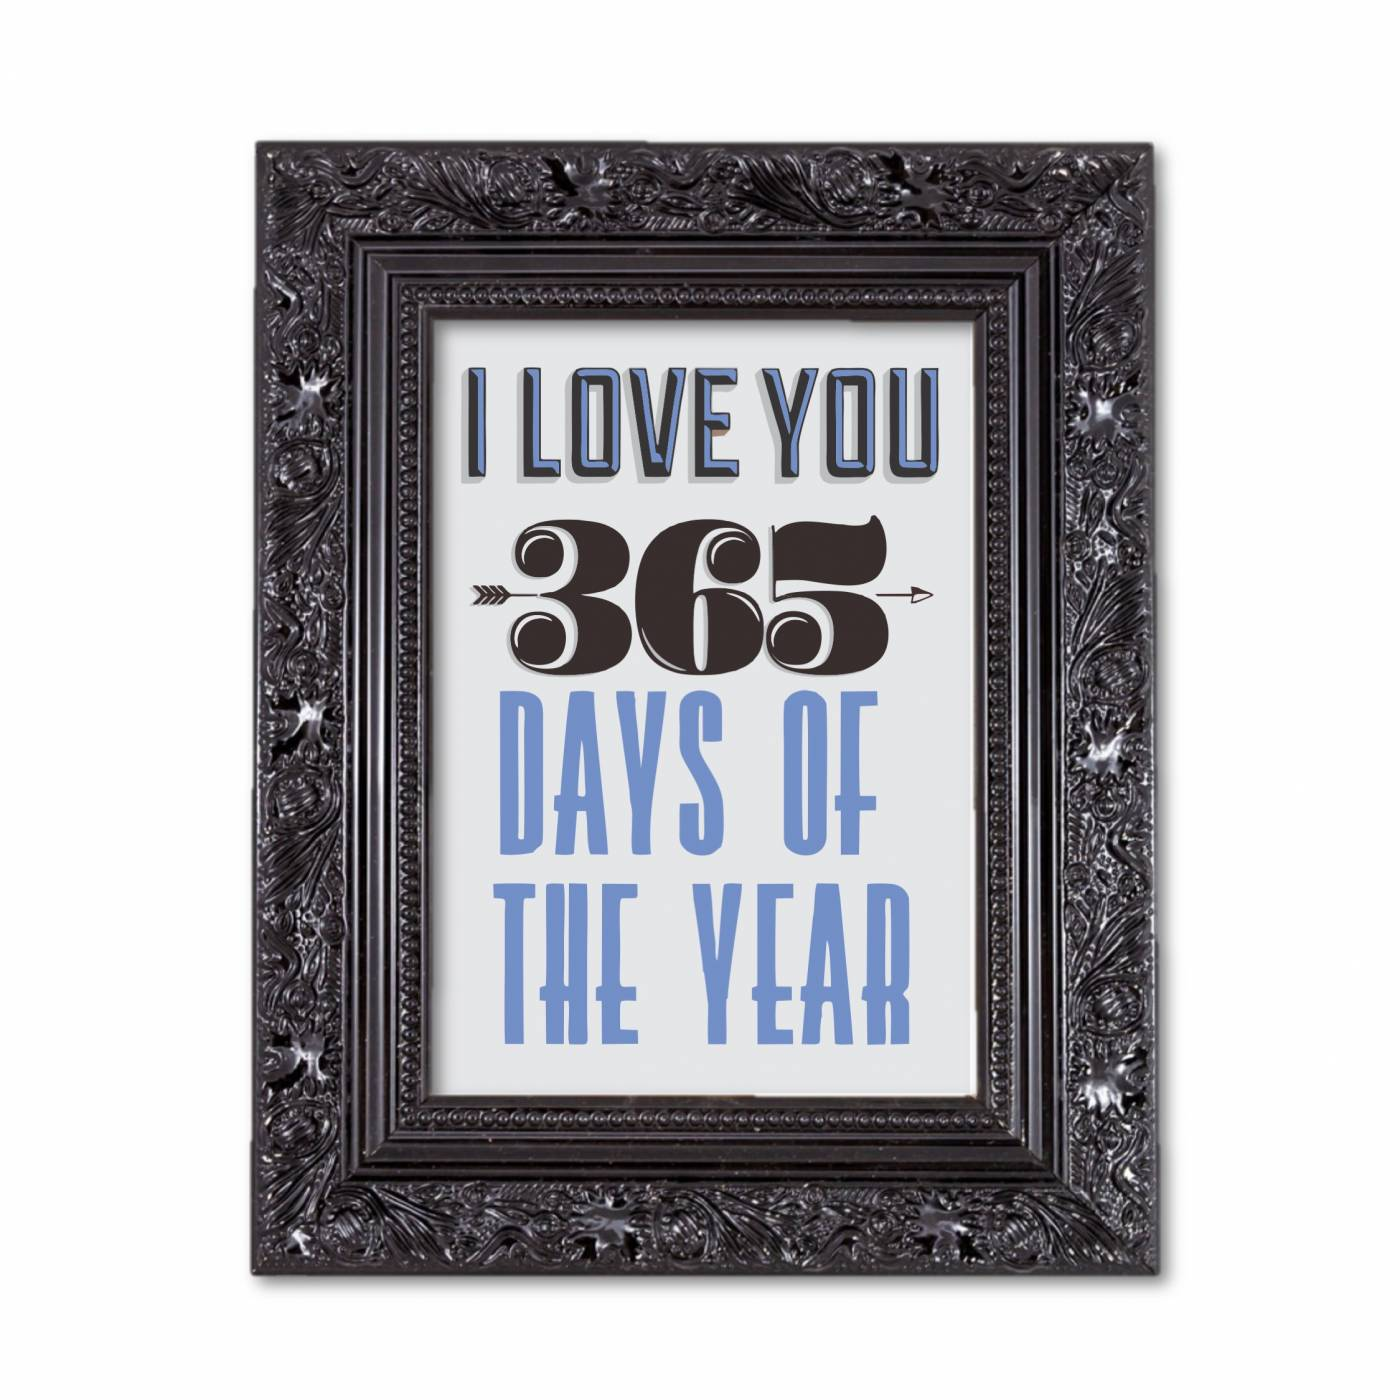 I love you 365 days